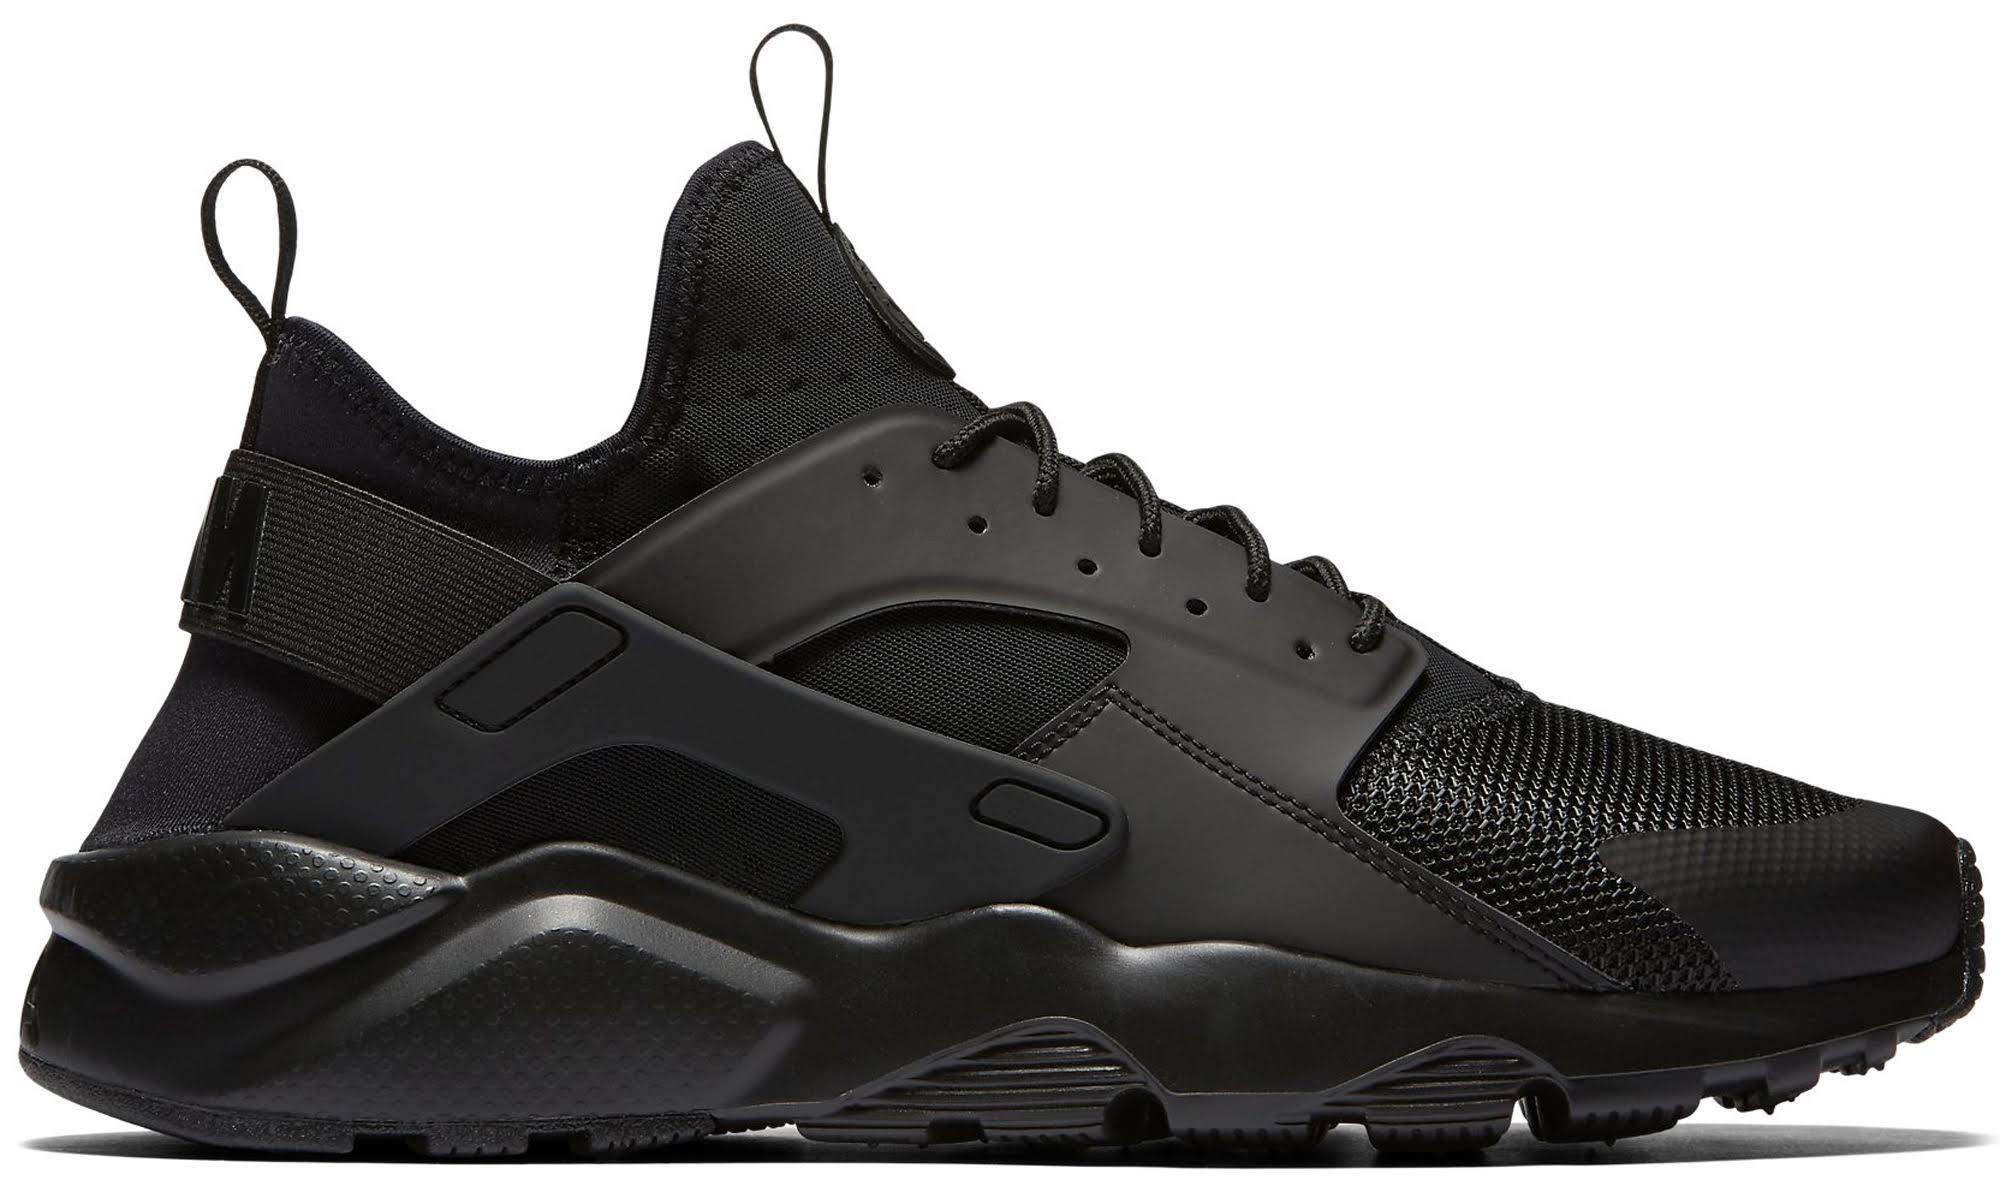 Black black Air Run Nike Men black Shoes Ultra Black Universal 819685002 Huarache Zz6aqwB